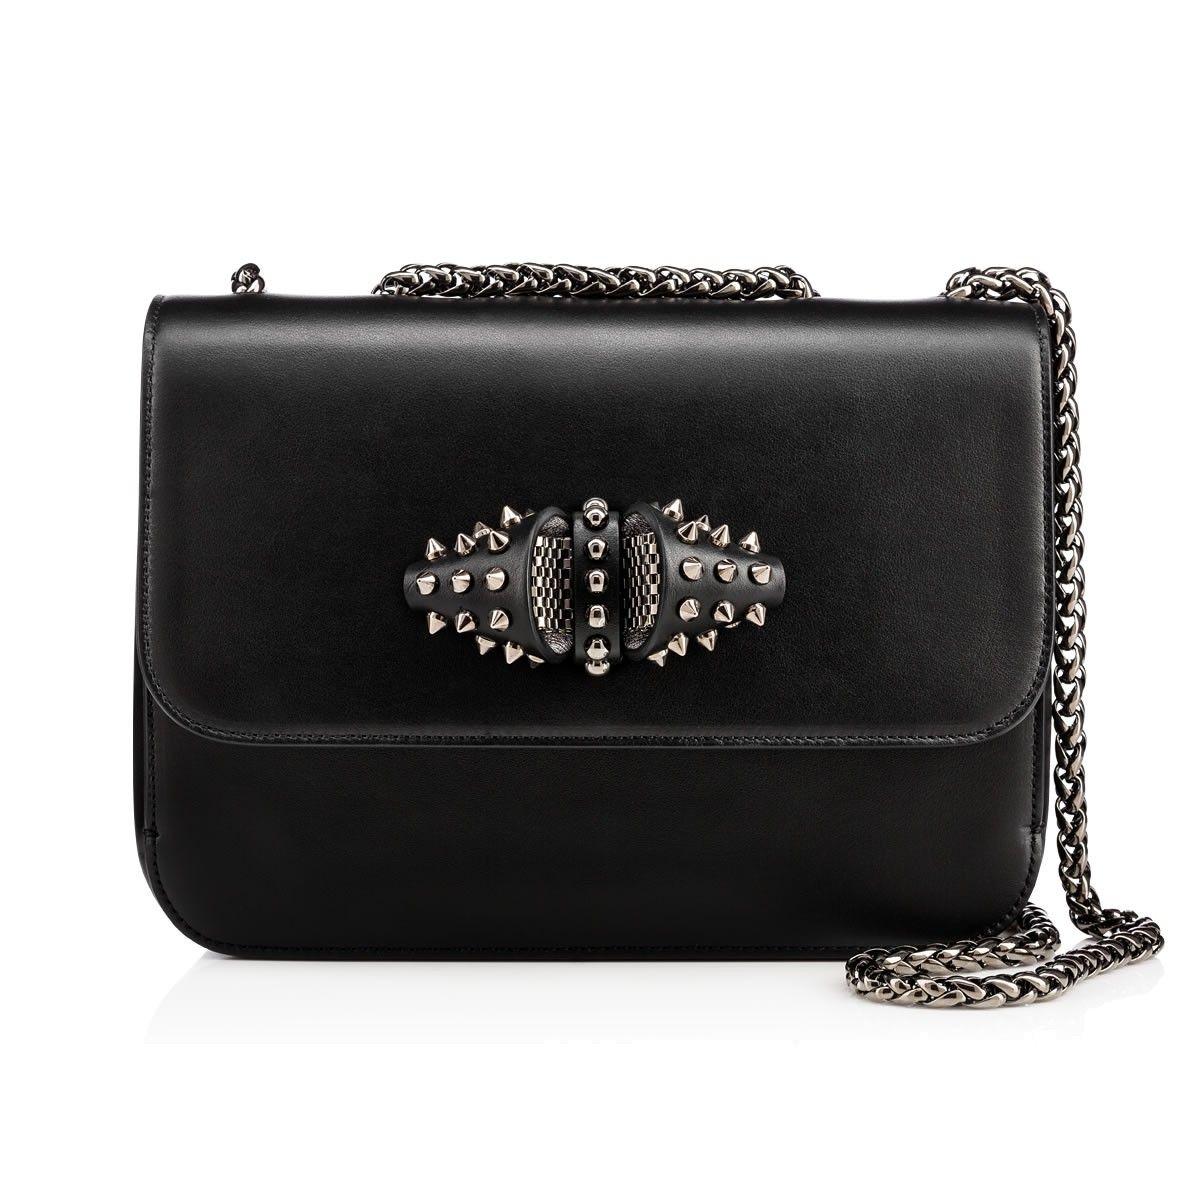 dee36d6e7c6 Bags - Sweet Charity Small Chain Bag - Christian Louboutin | Fashion ...